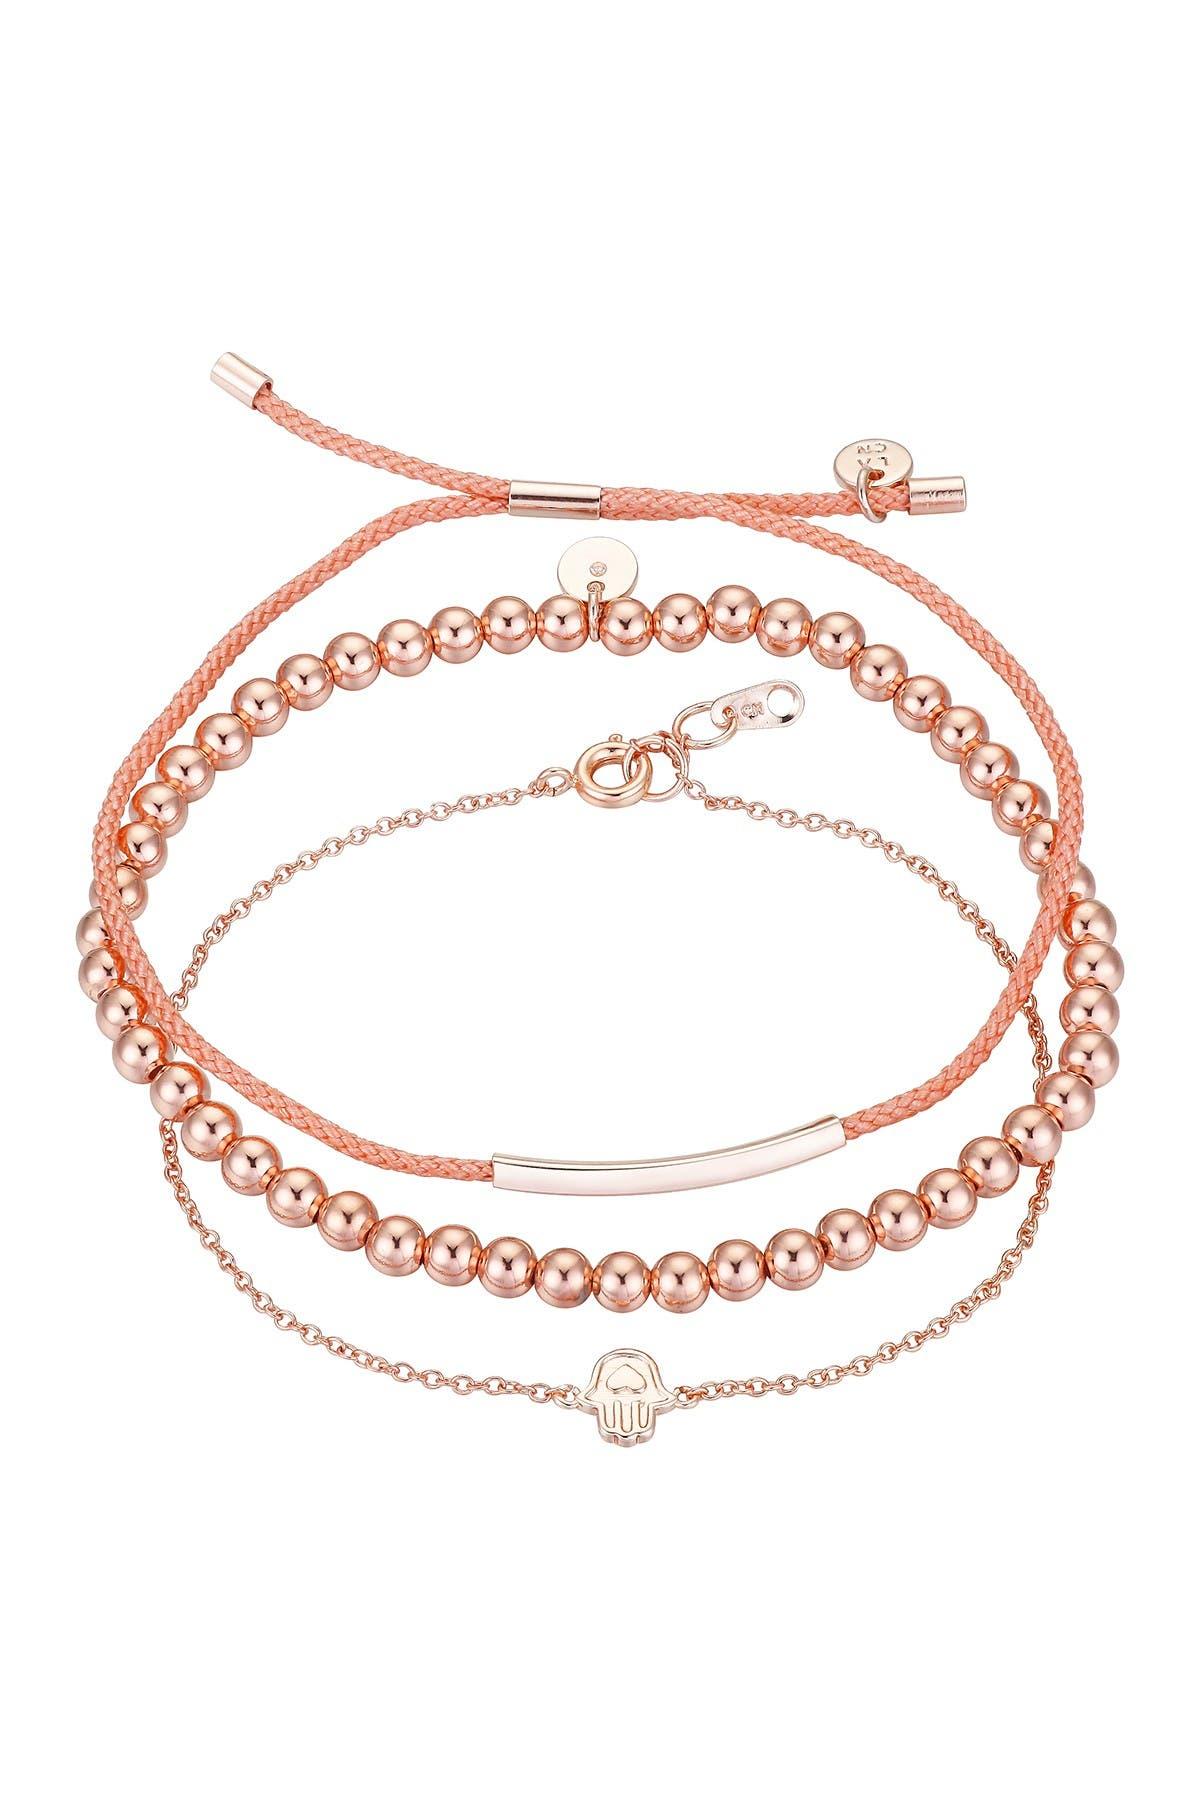 Image of LA Rocks Rose Gold Plated Beaded, Bolo Cord, & Hamsa Charm Bracelet Set